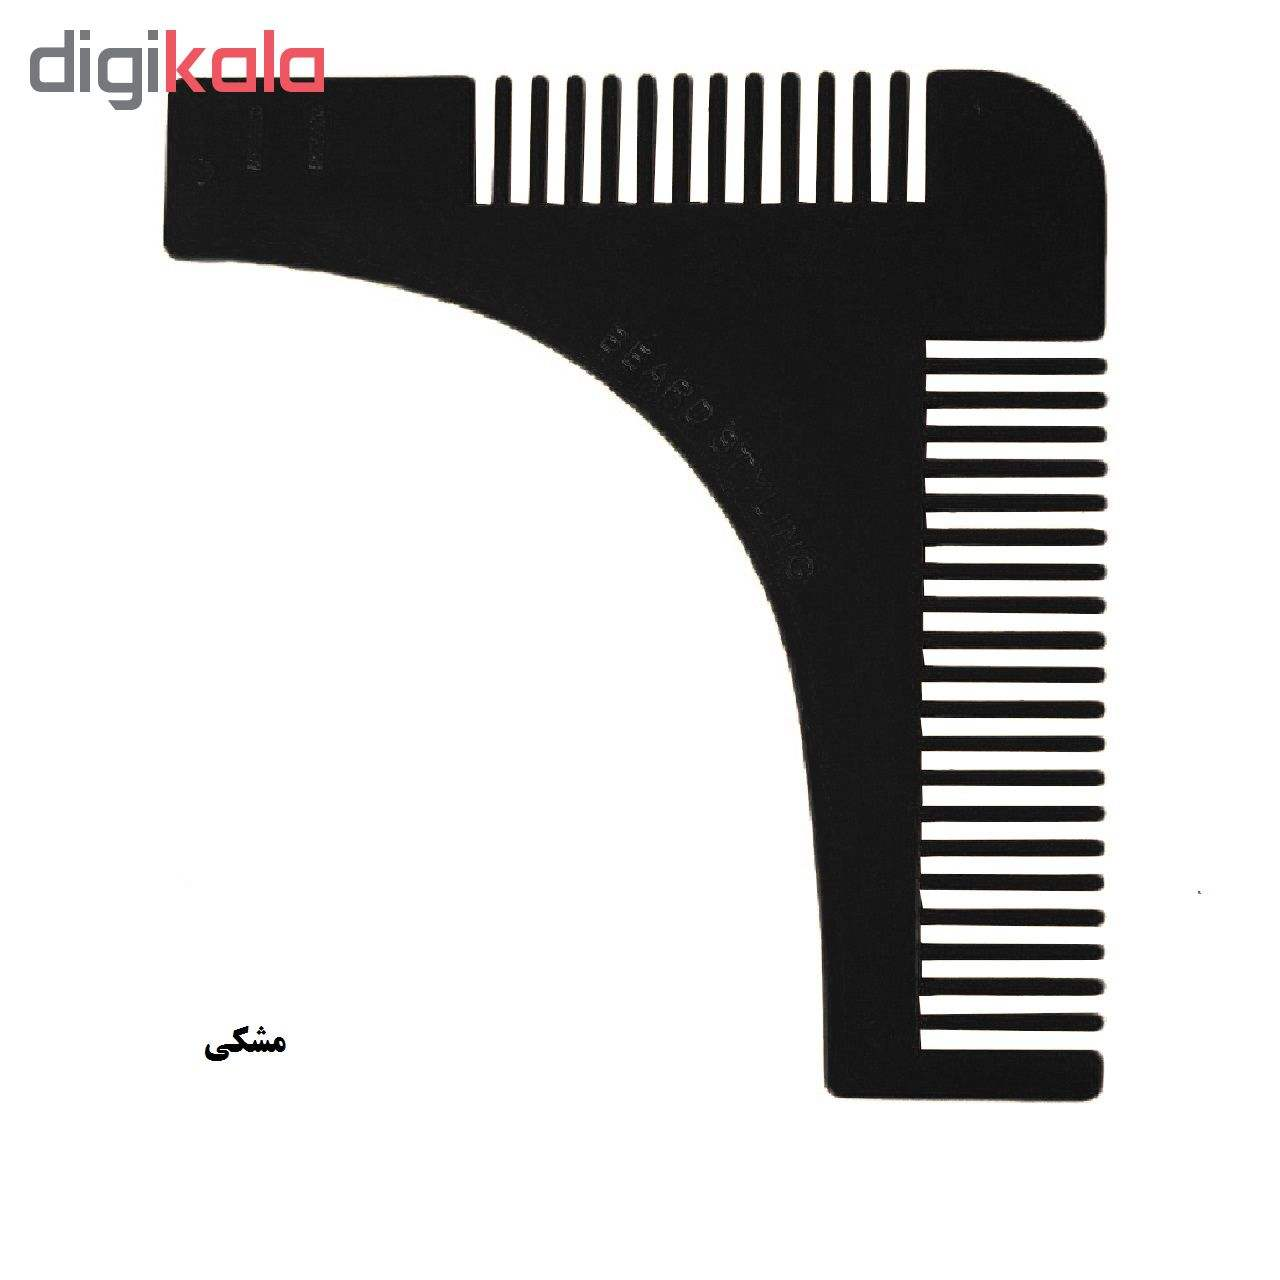 شانه اصلاح ریش مدل Beard Styling main 1 2